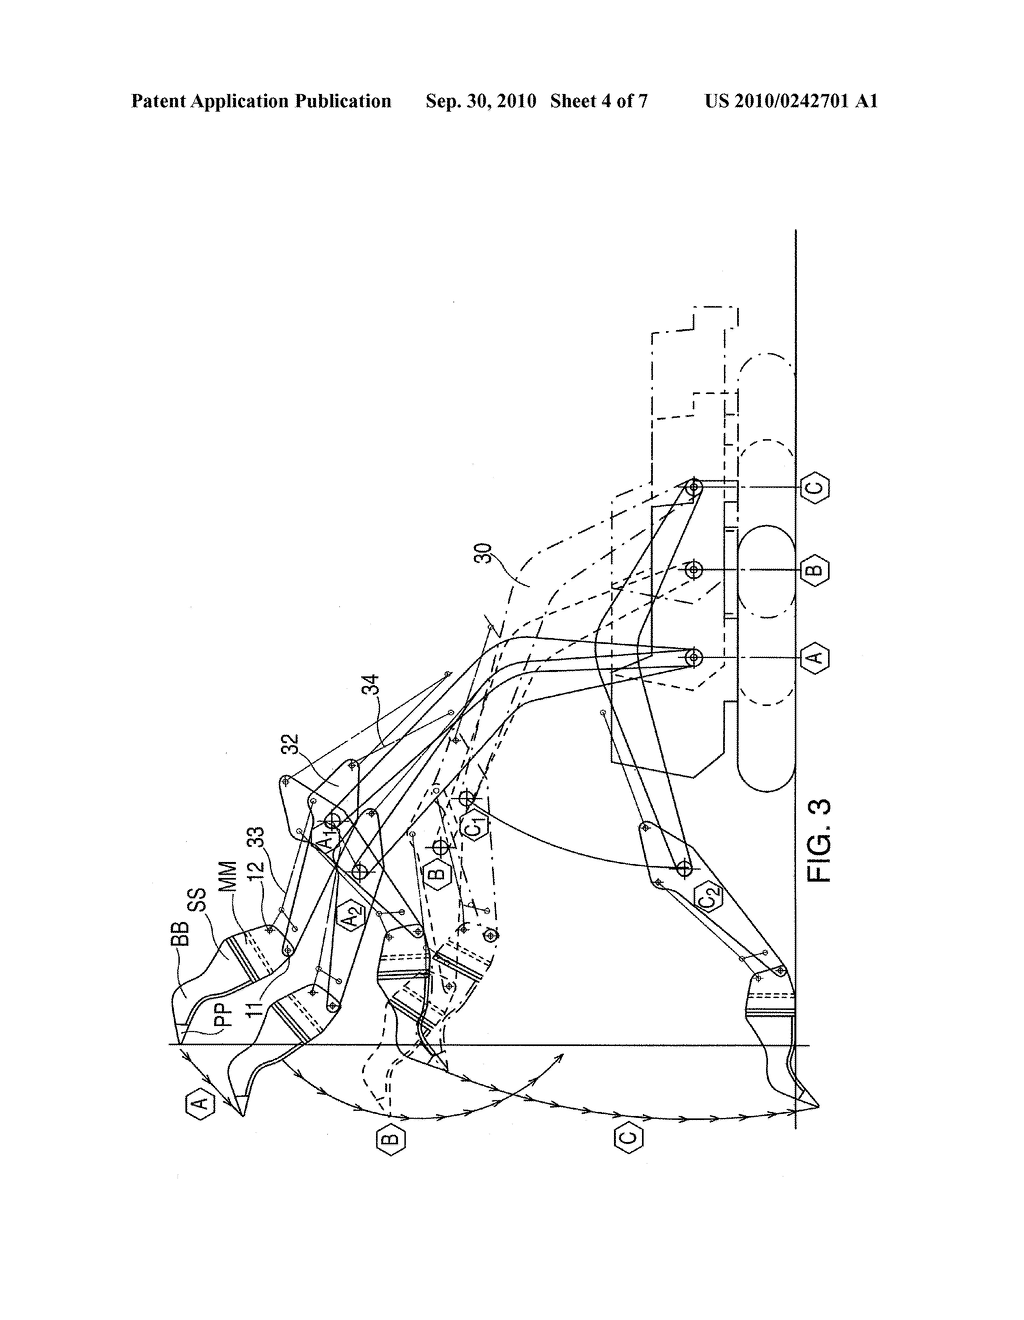 A Schematic Of Hydraulic Arm Library Wiring Diagrams Jd 2020 Diagram House Symbols U2022 Rh Maxturner Co System Cylinders